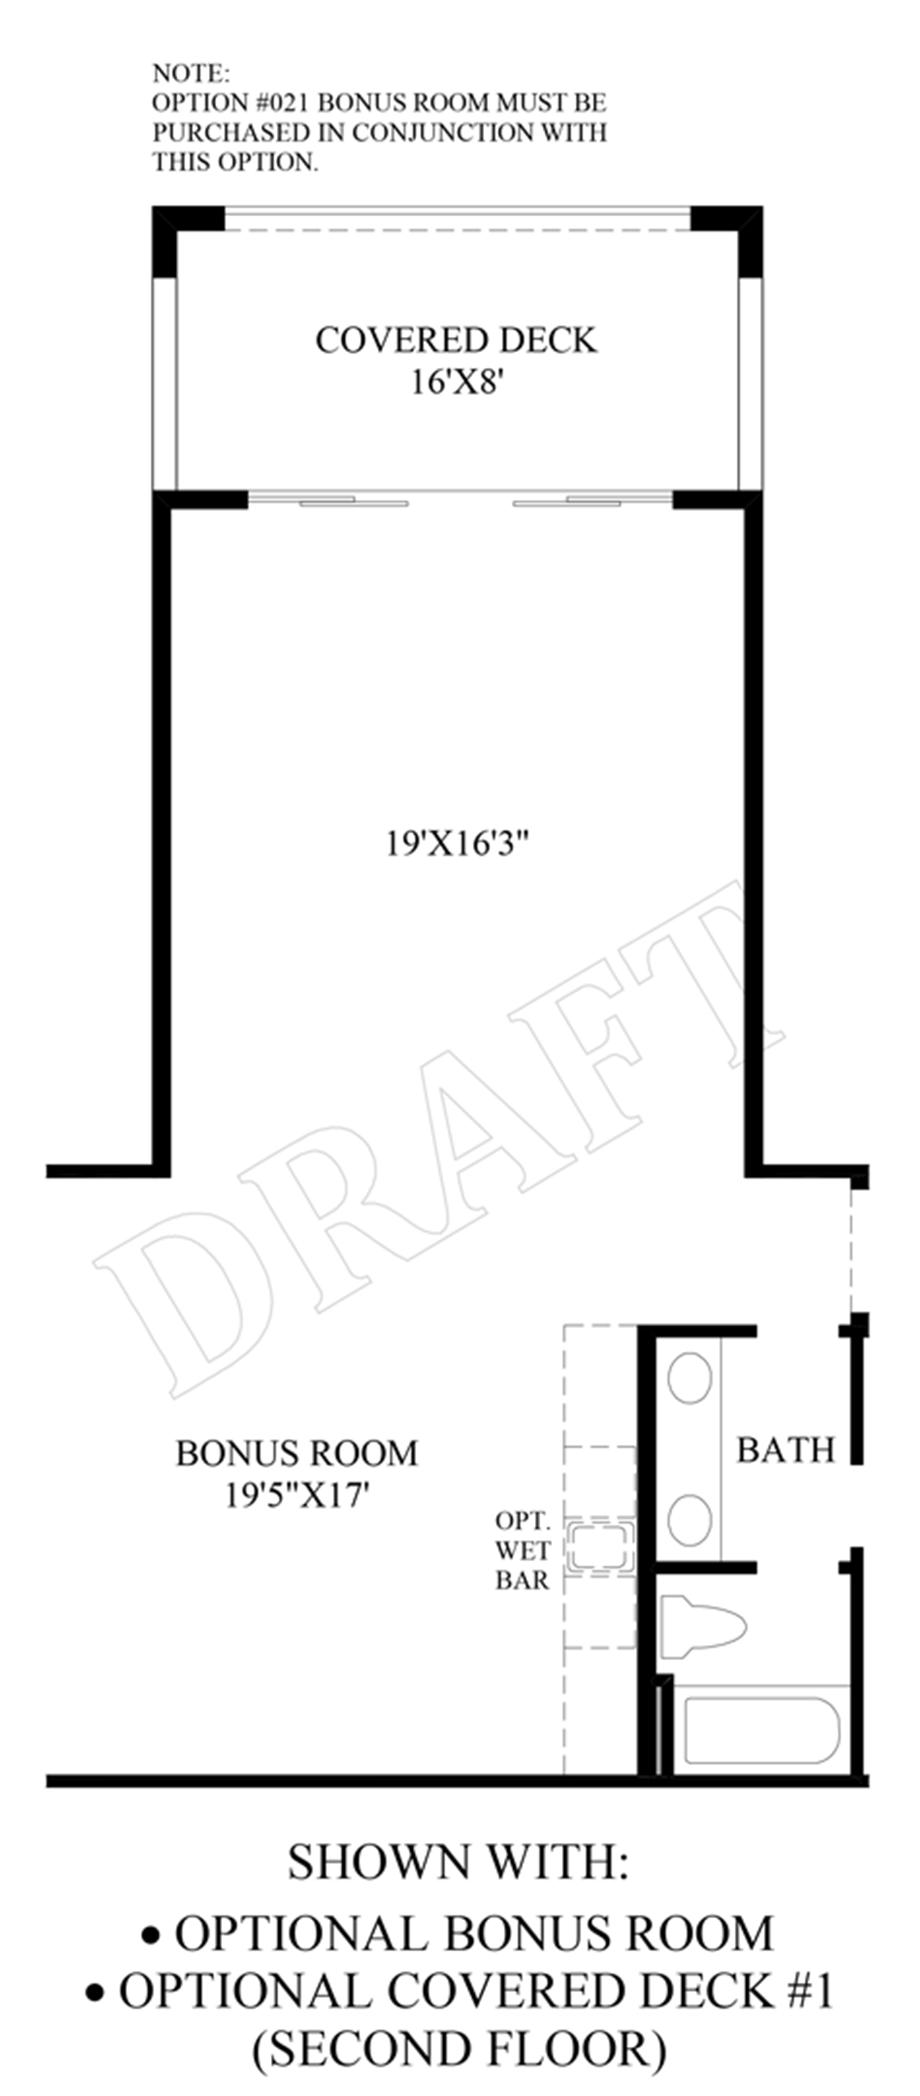 Optional Bonus Room & Covered Deck (2nd Floor) Floor Plan